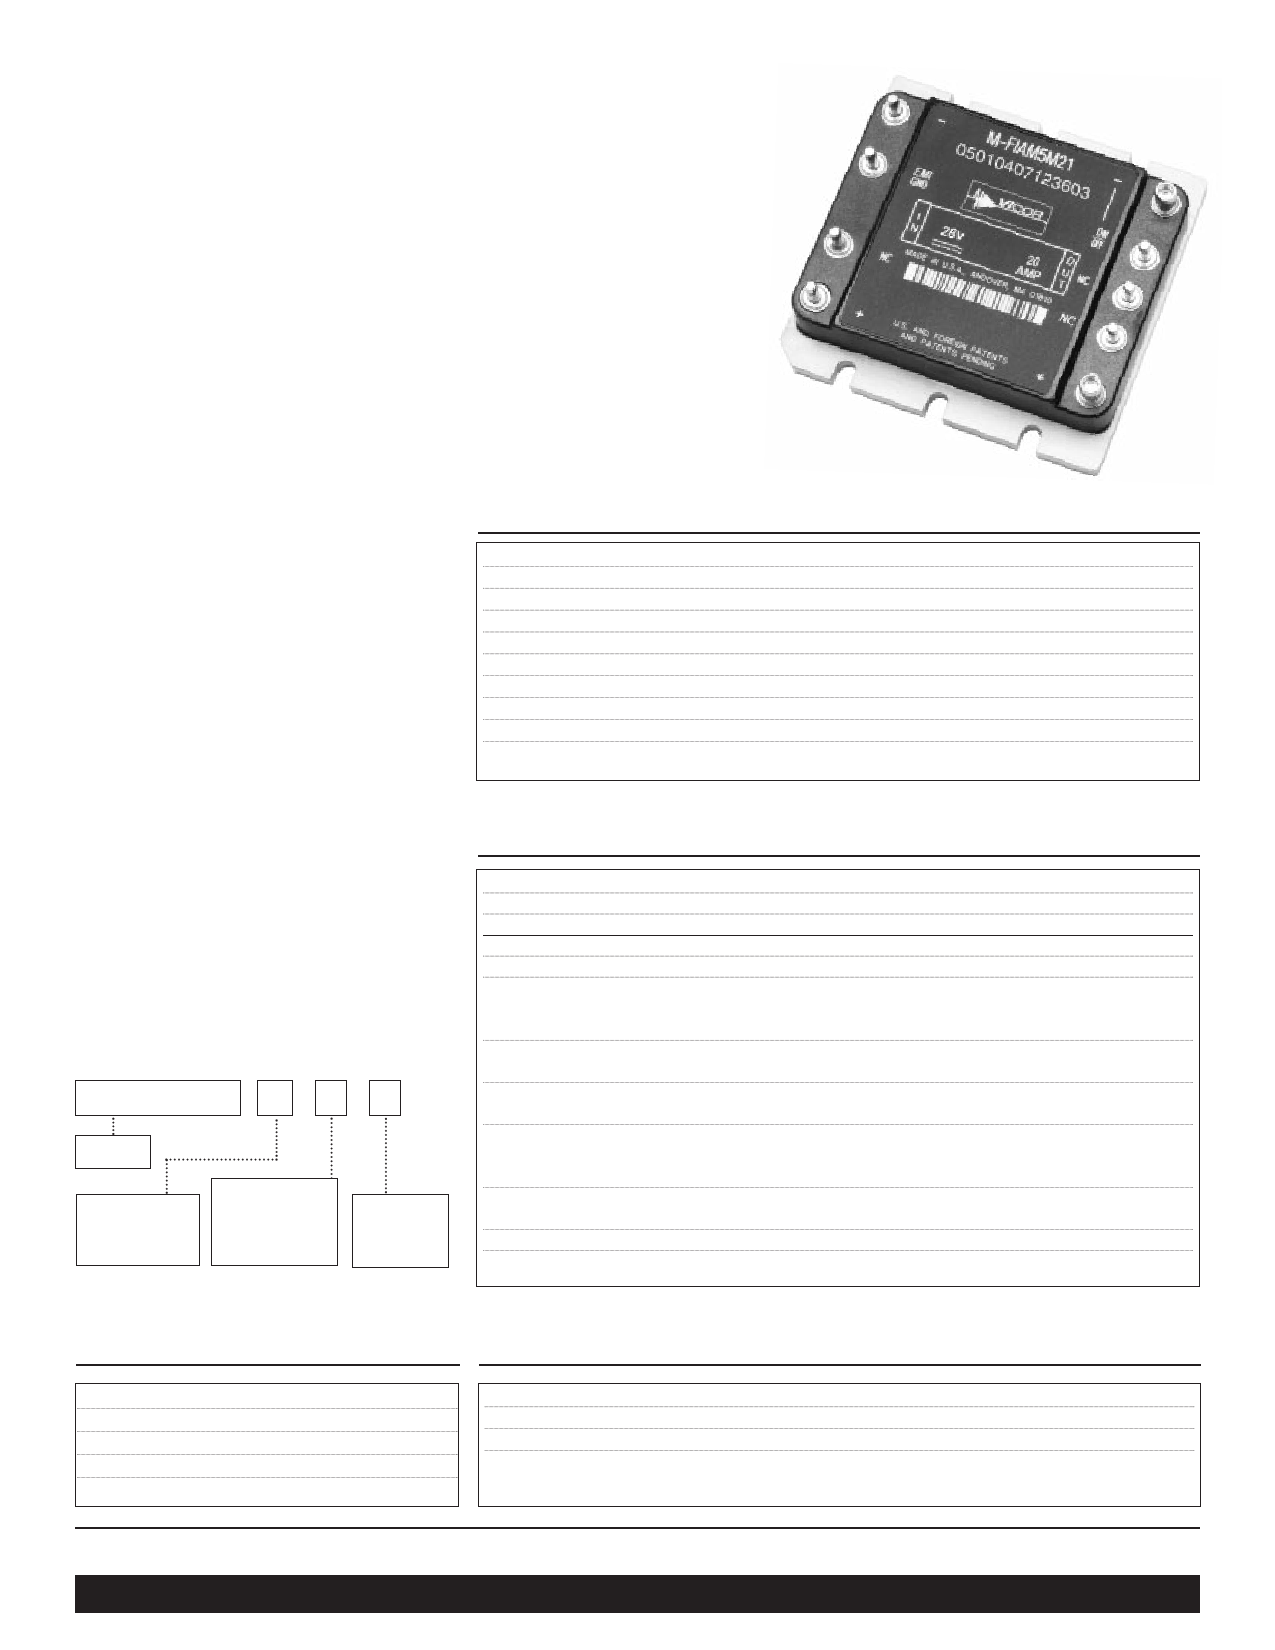 M-FIAM5HS2 datasheet